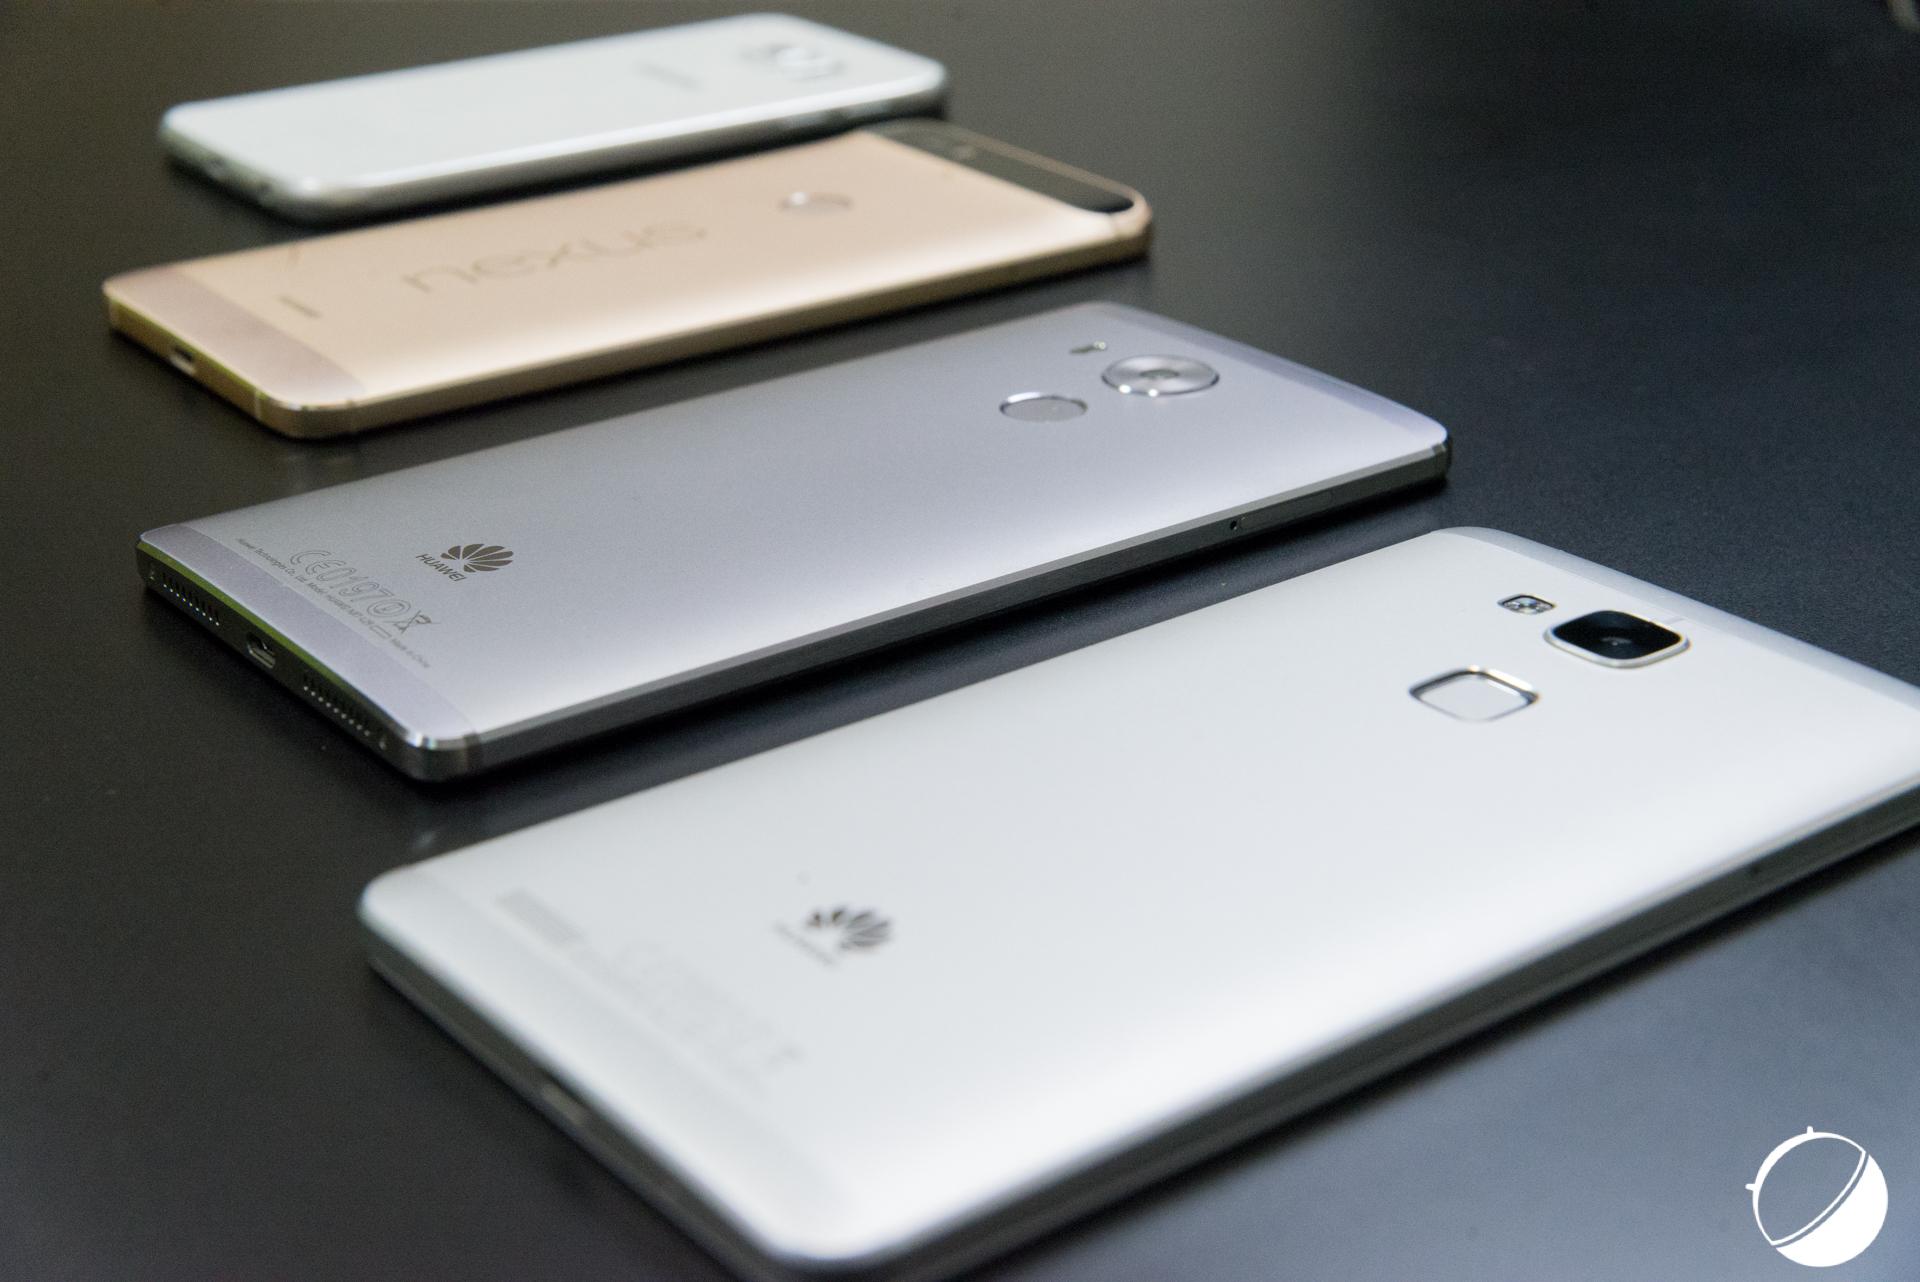 Huawei Kirin 950, Qualcomm Snapdragon 810, Samsung Exynos 7420 : le choc des puces haut de gamme